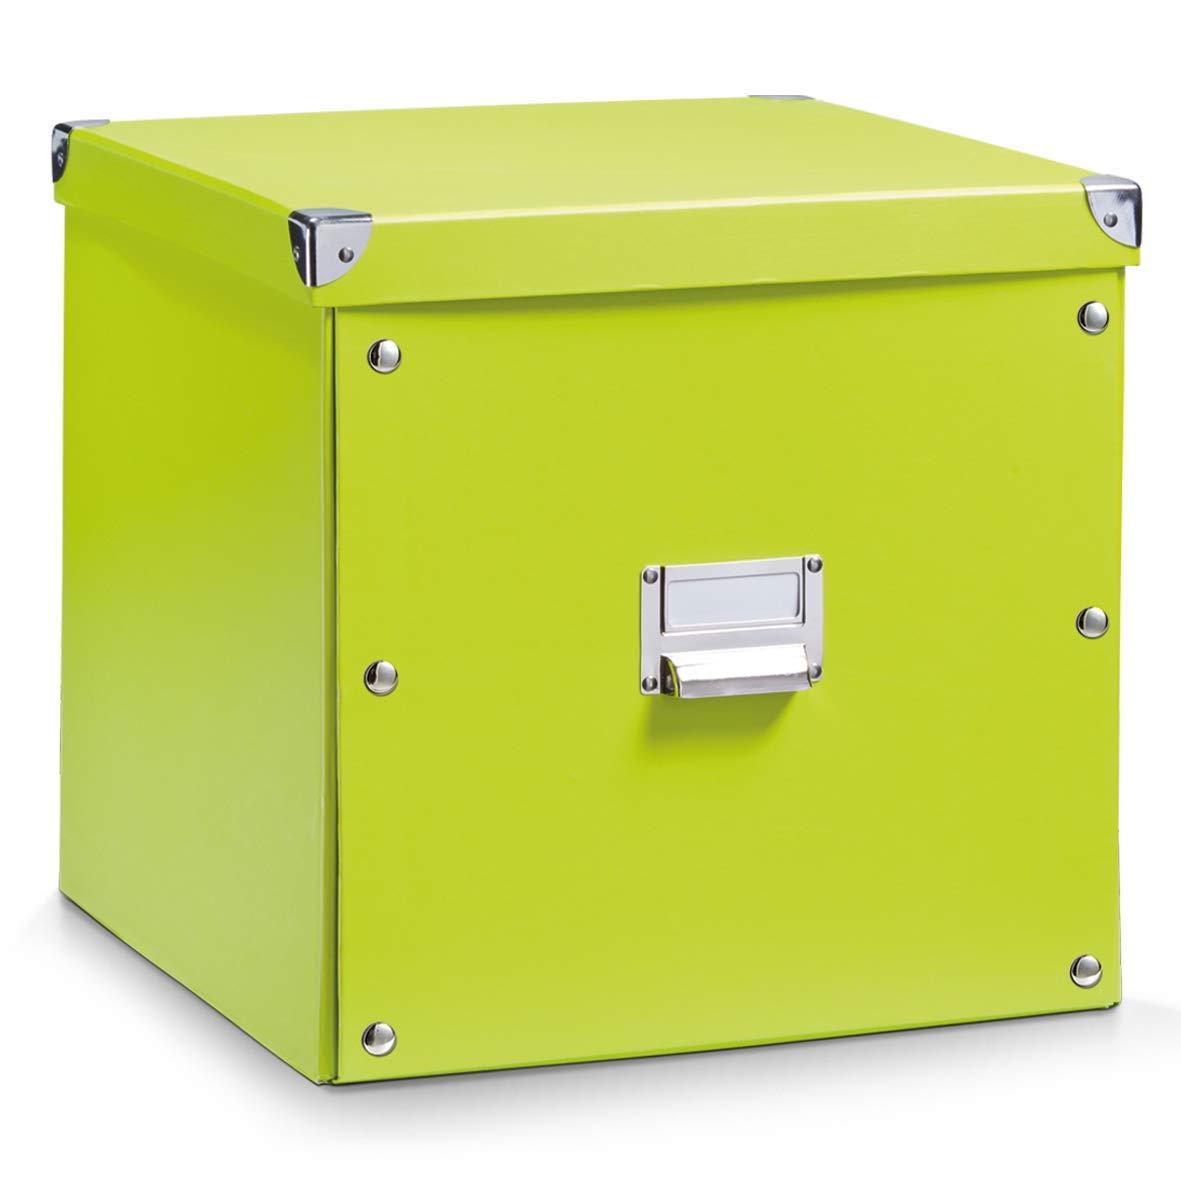 Zeller 17636 Caja de almacenaje de cartón Verde (Grun) 33.5 x 33 x 32 cm: Amazon.es: Hogar